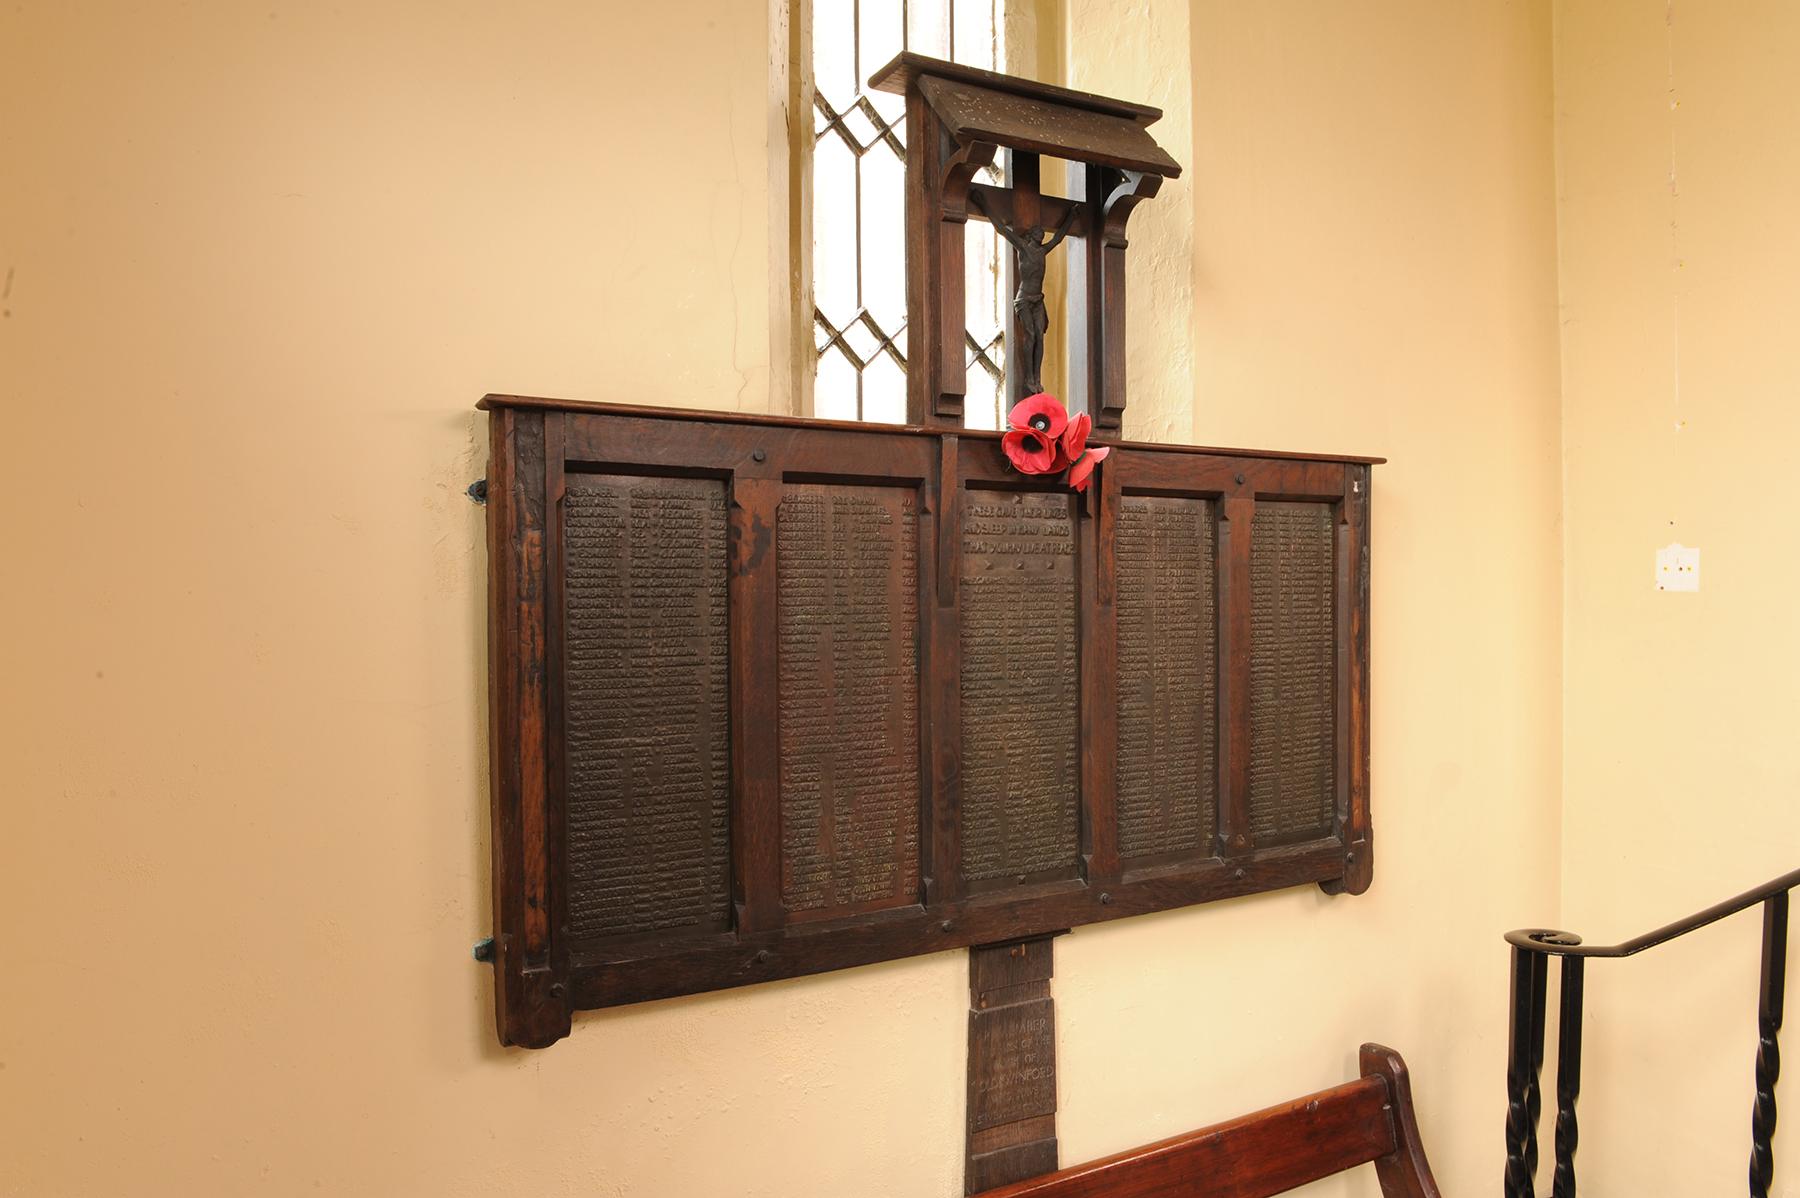 oldswinford-war-memorial-05_1407151310.jpg